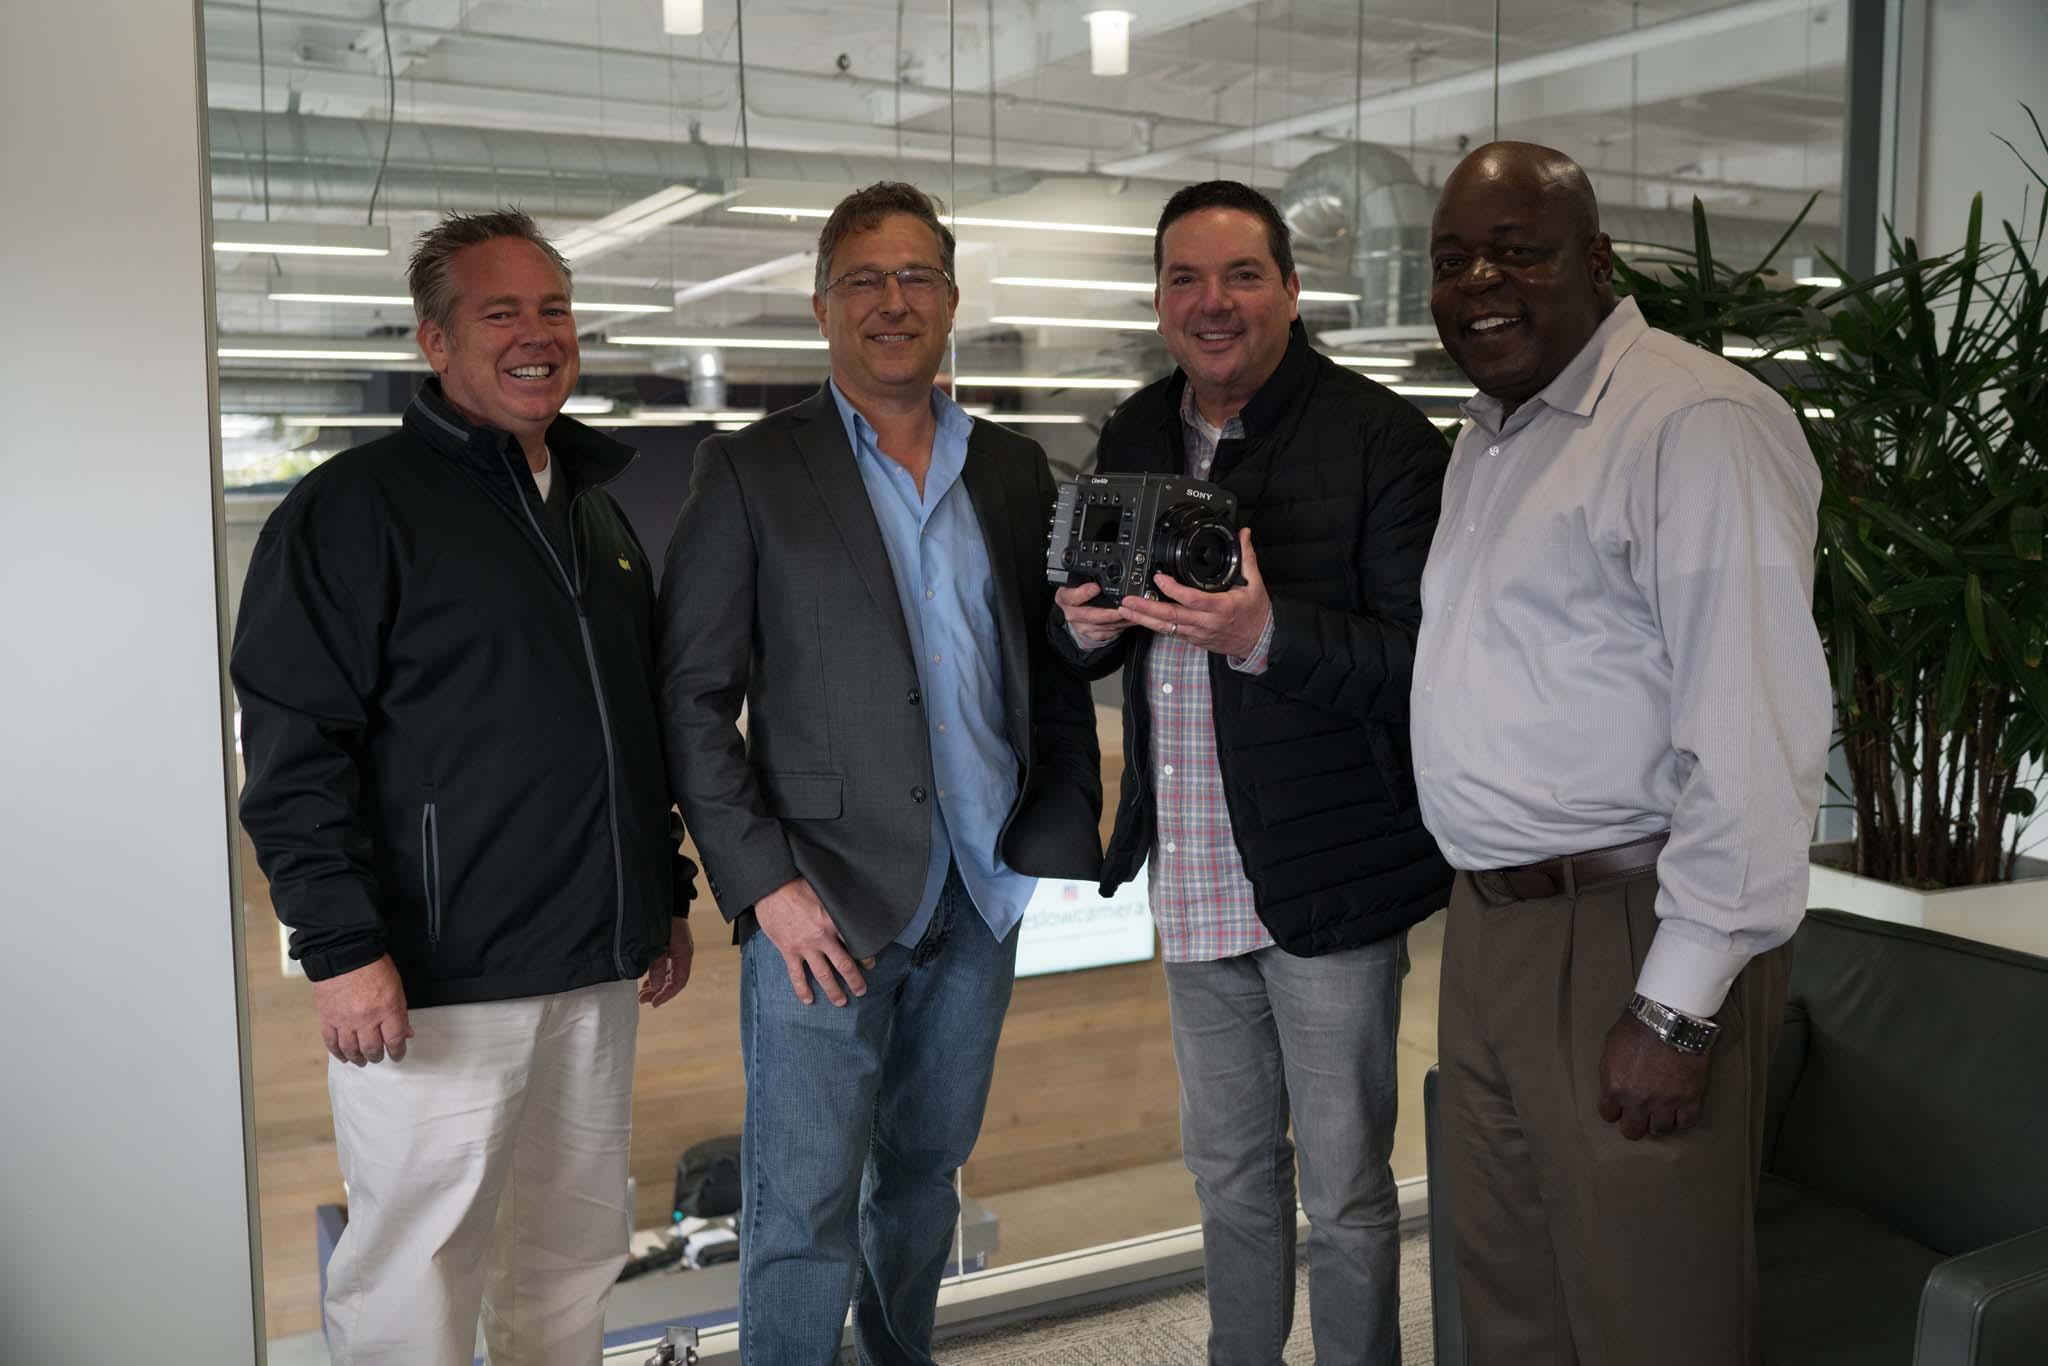 From Left: Dan Perry, Peter Crithary, Robert Keslow, Reginald Watson